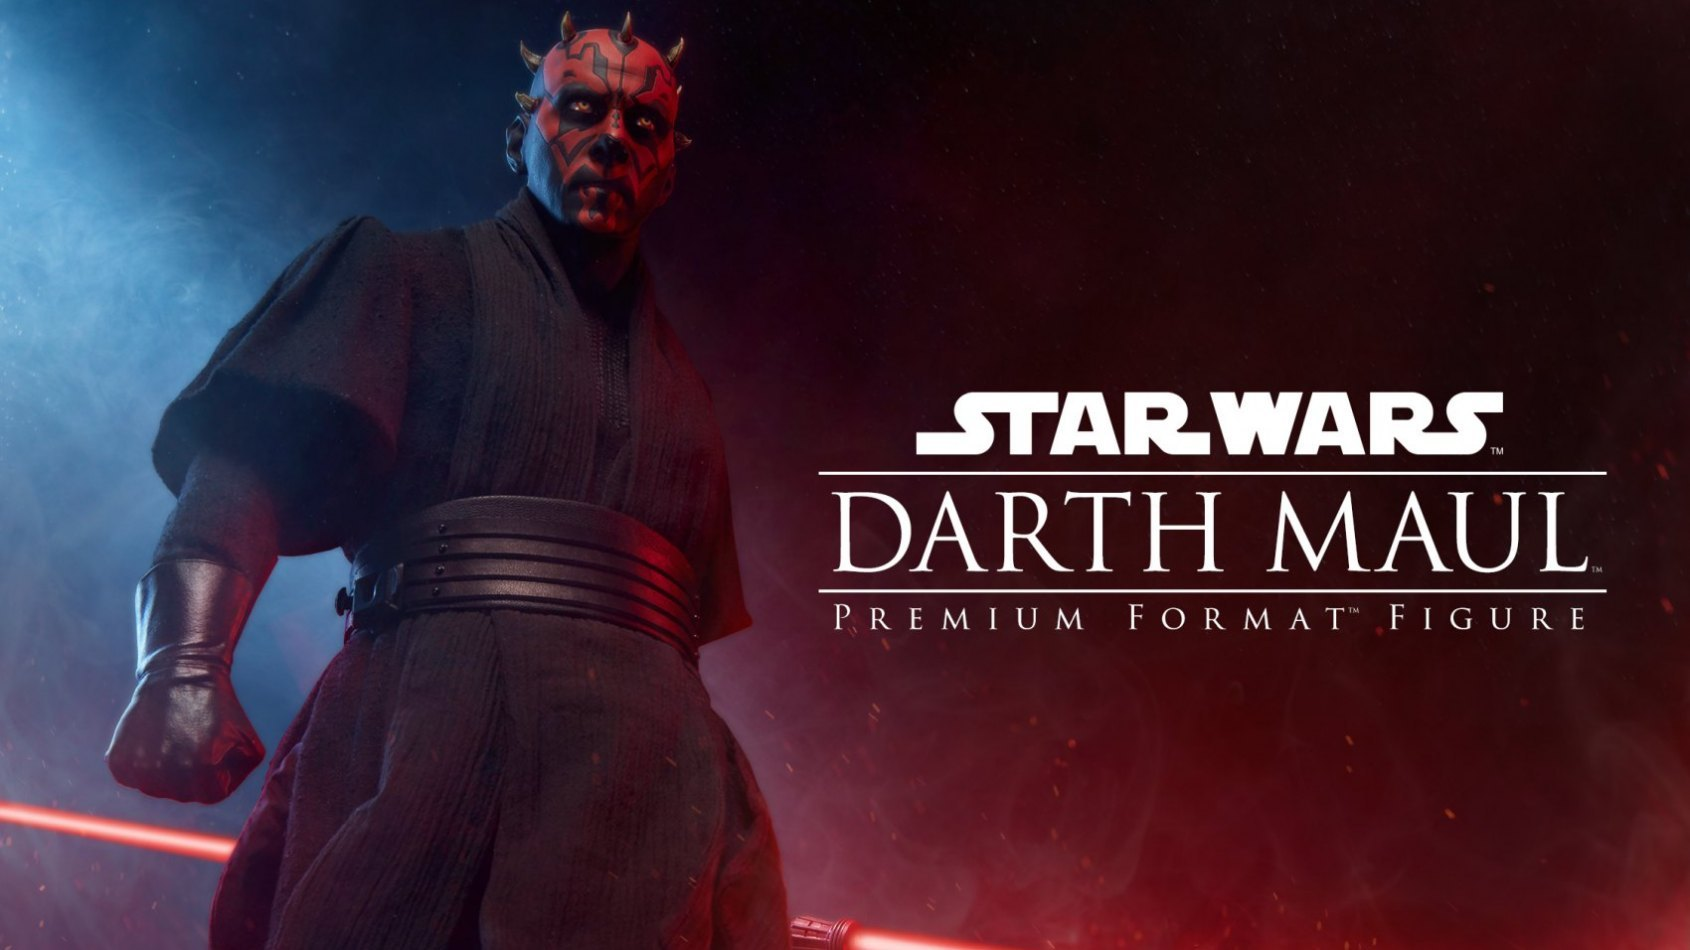 La figurine de Darth Maul annonc�e en Format Premium chez Sideshow